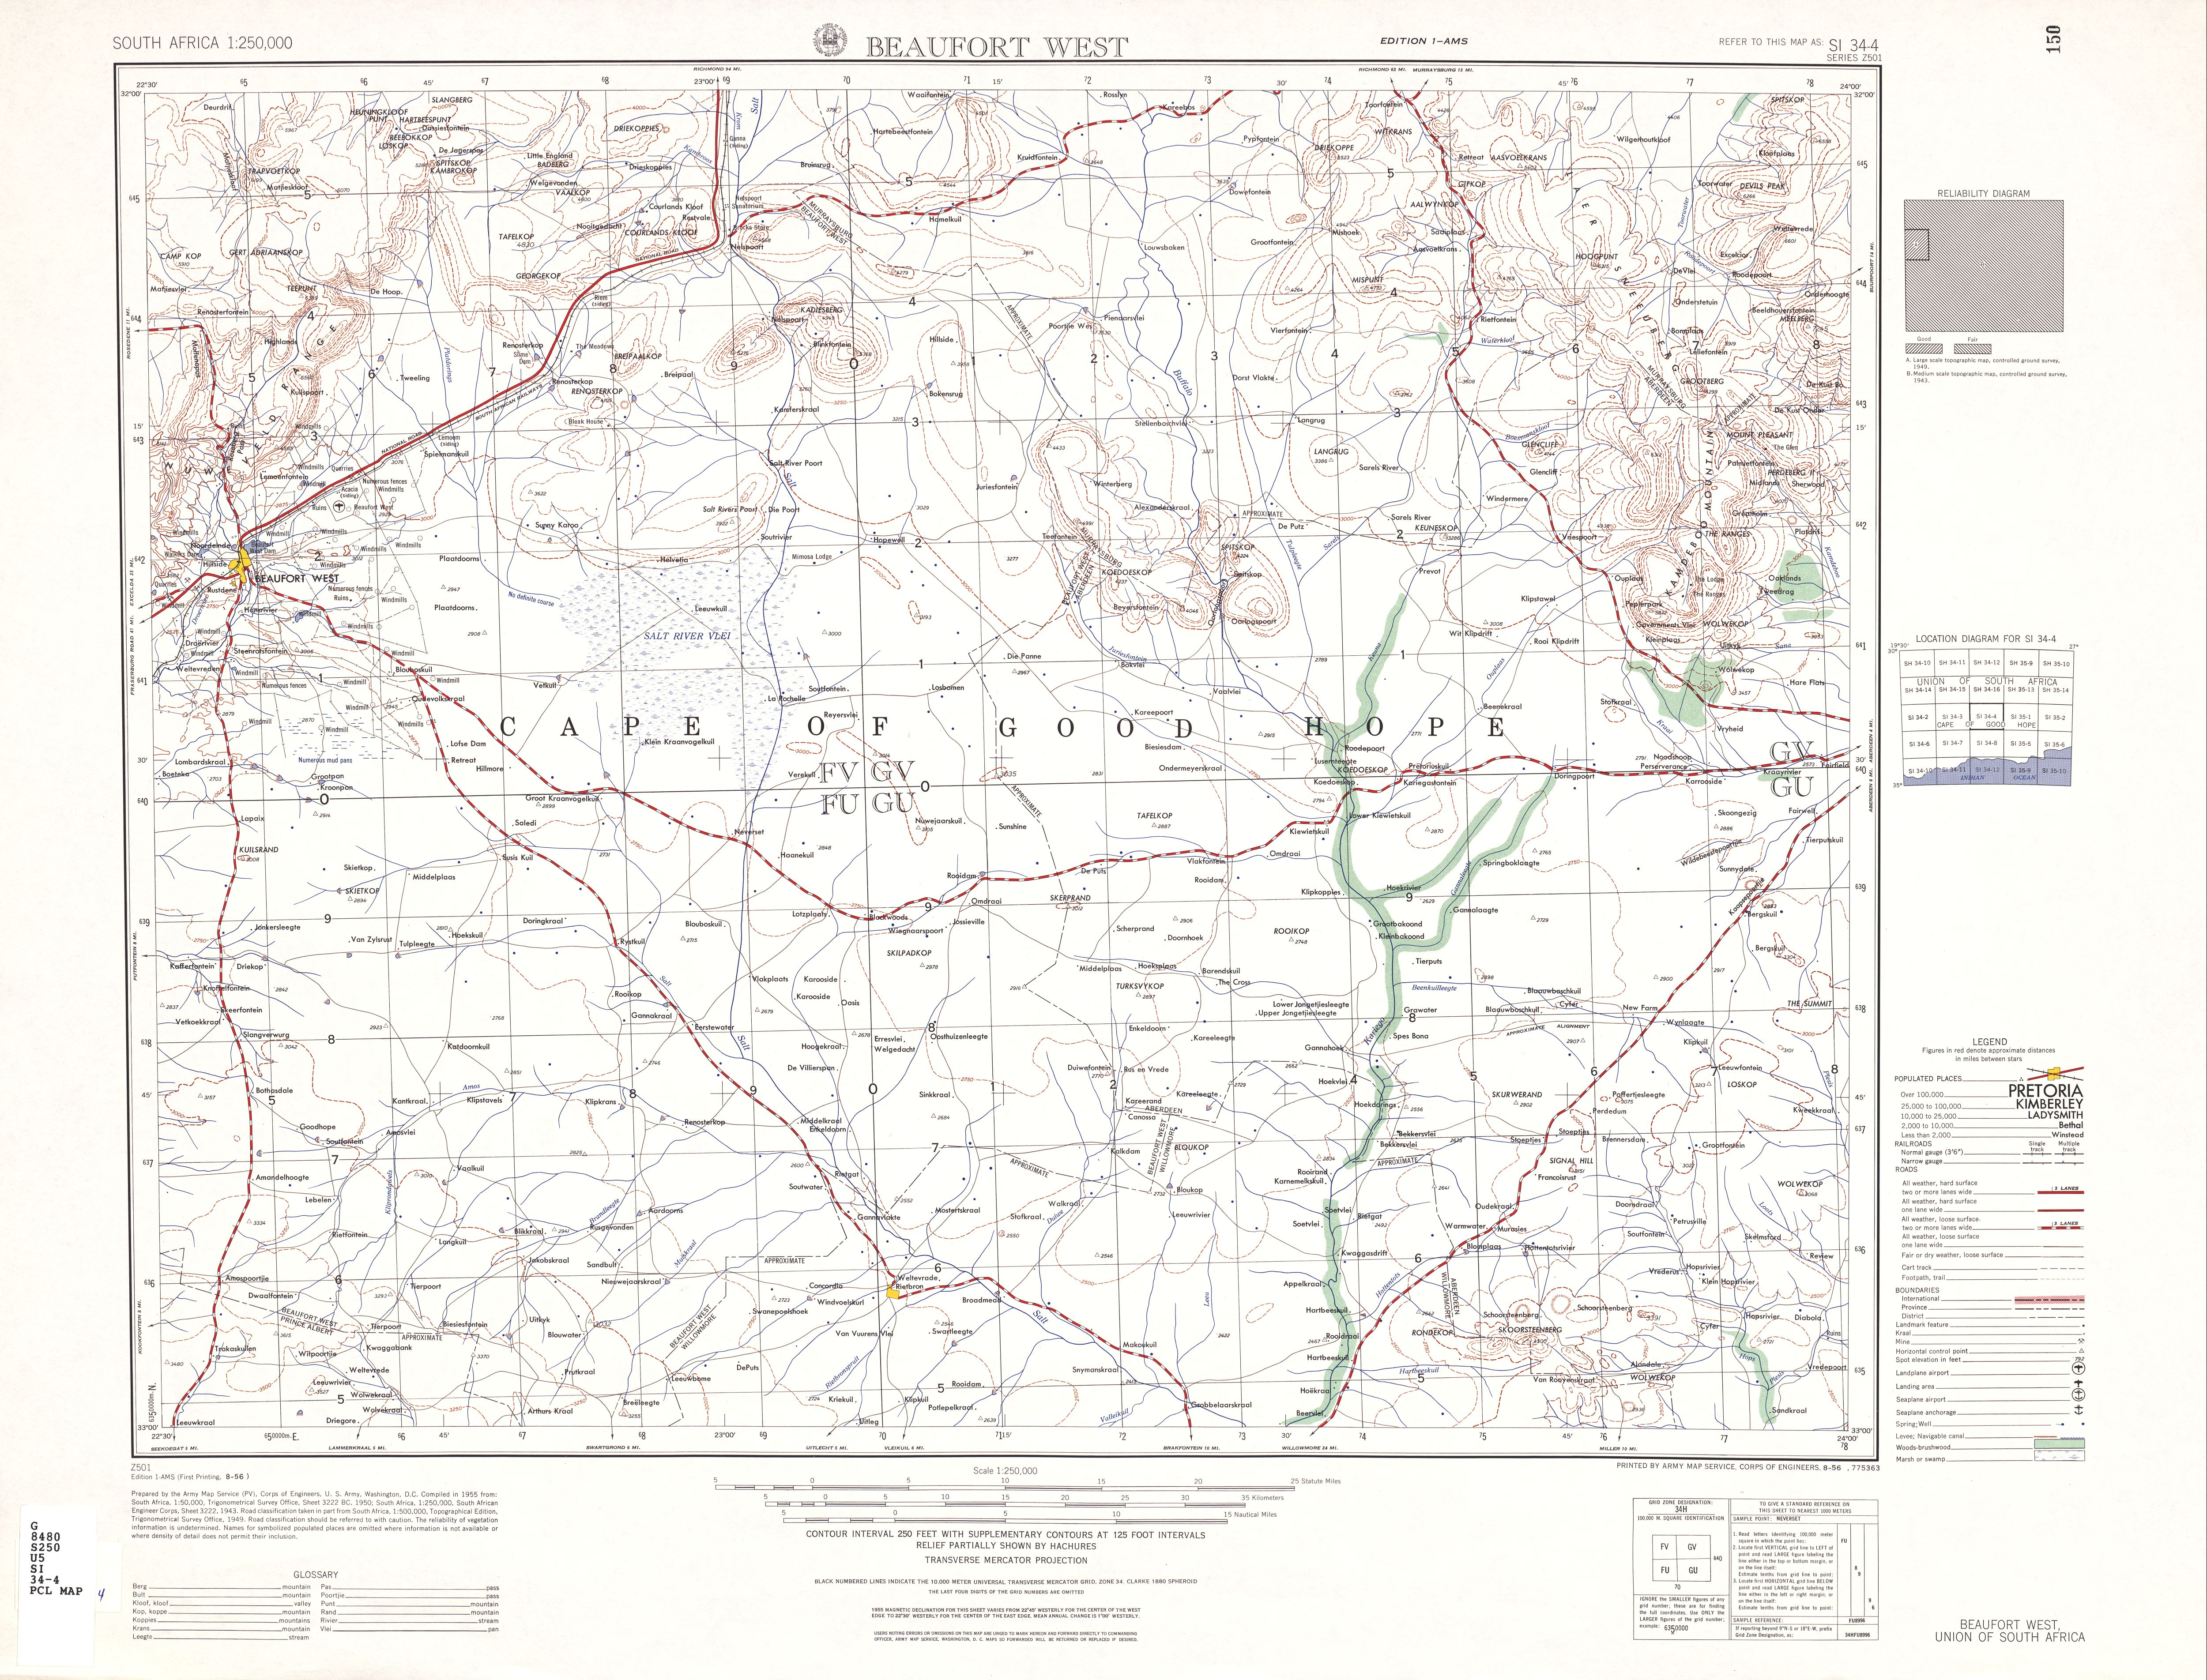 Hoja Beaufort West del Mapa Topográfico de África Meridional 1954